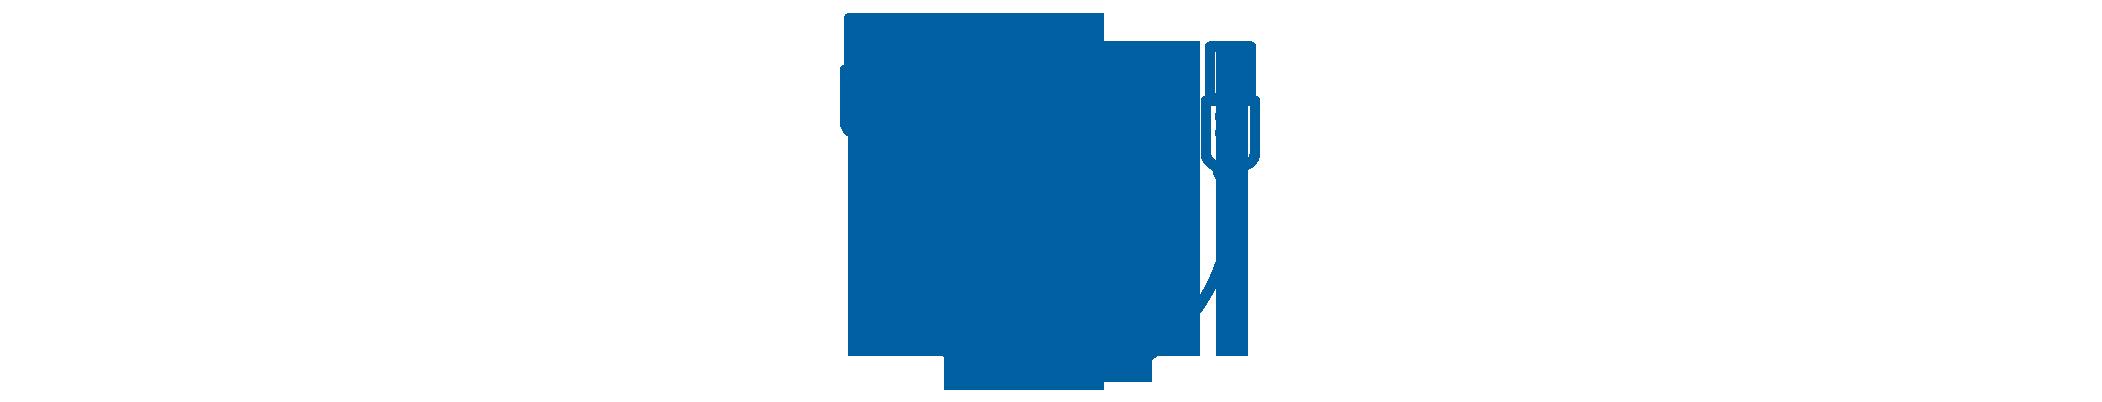 service-operateur-icone